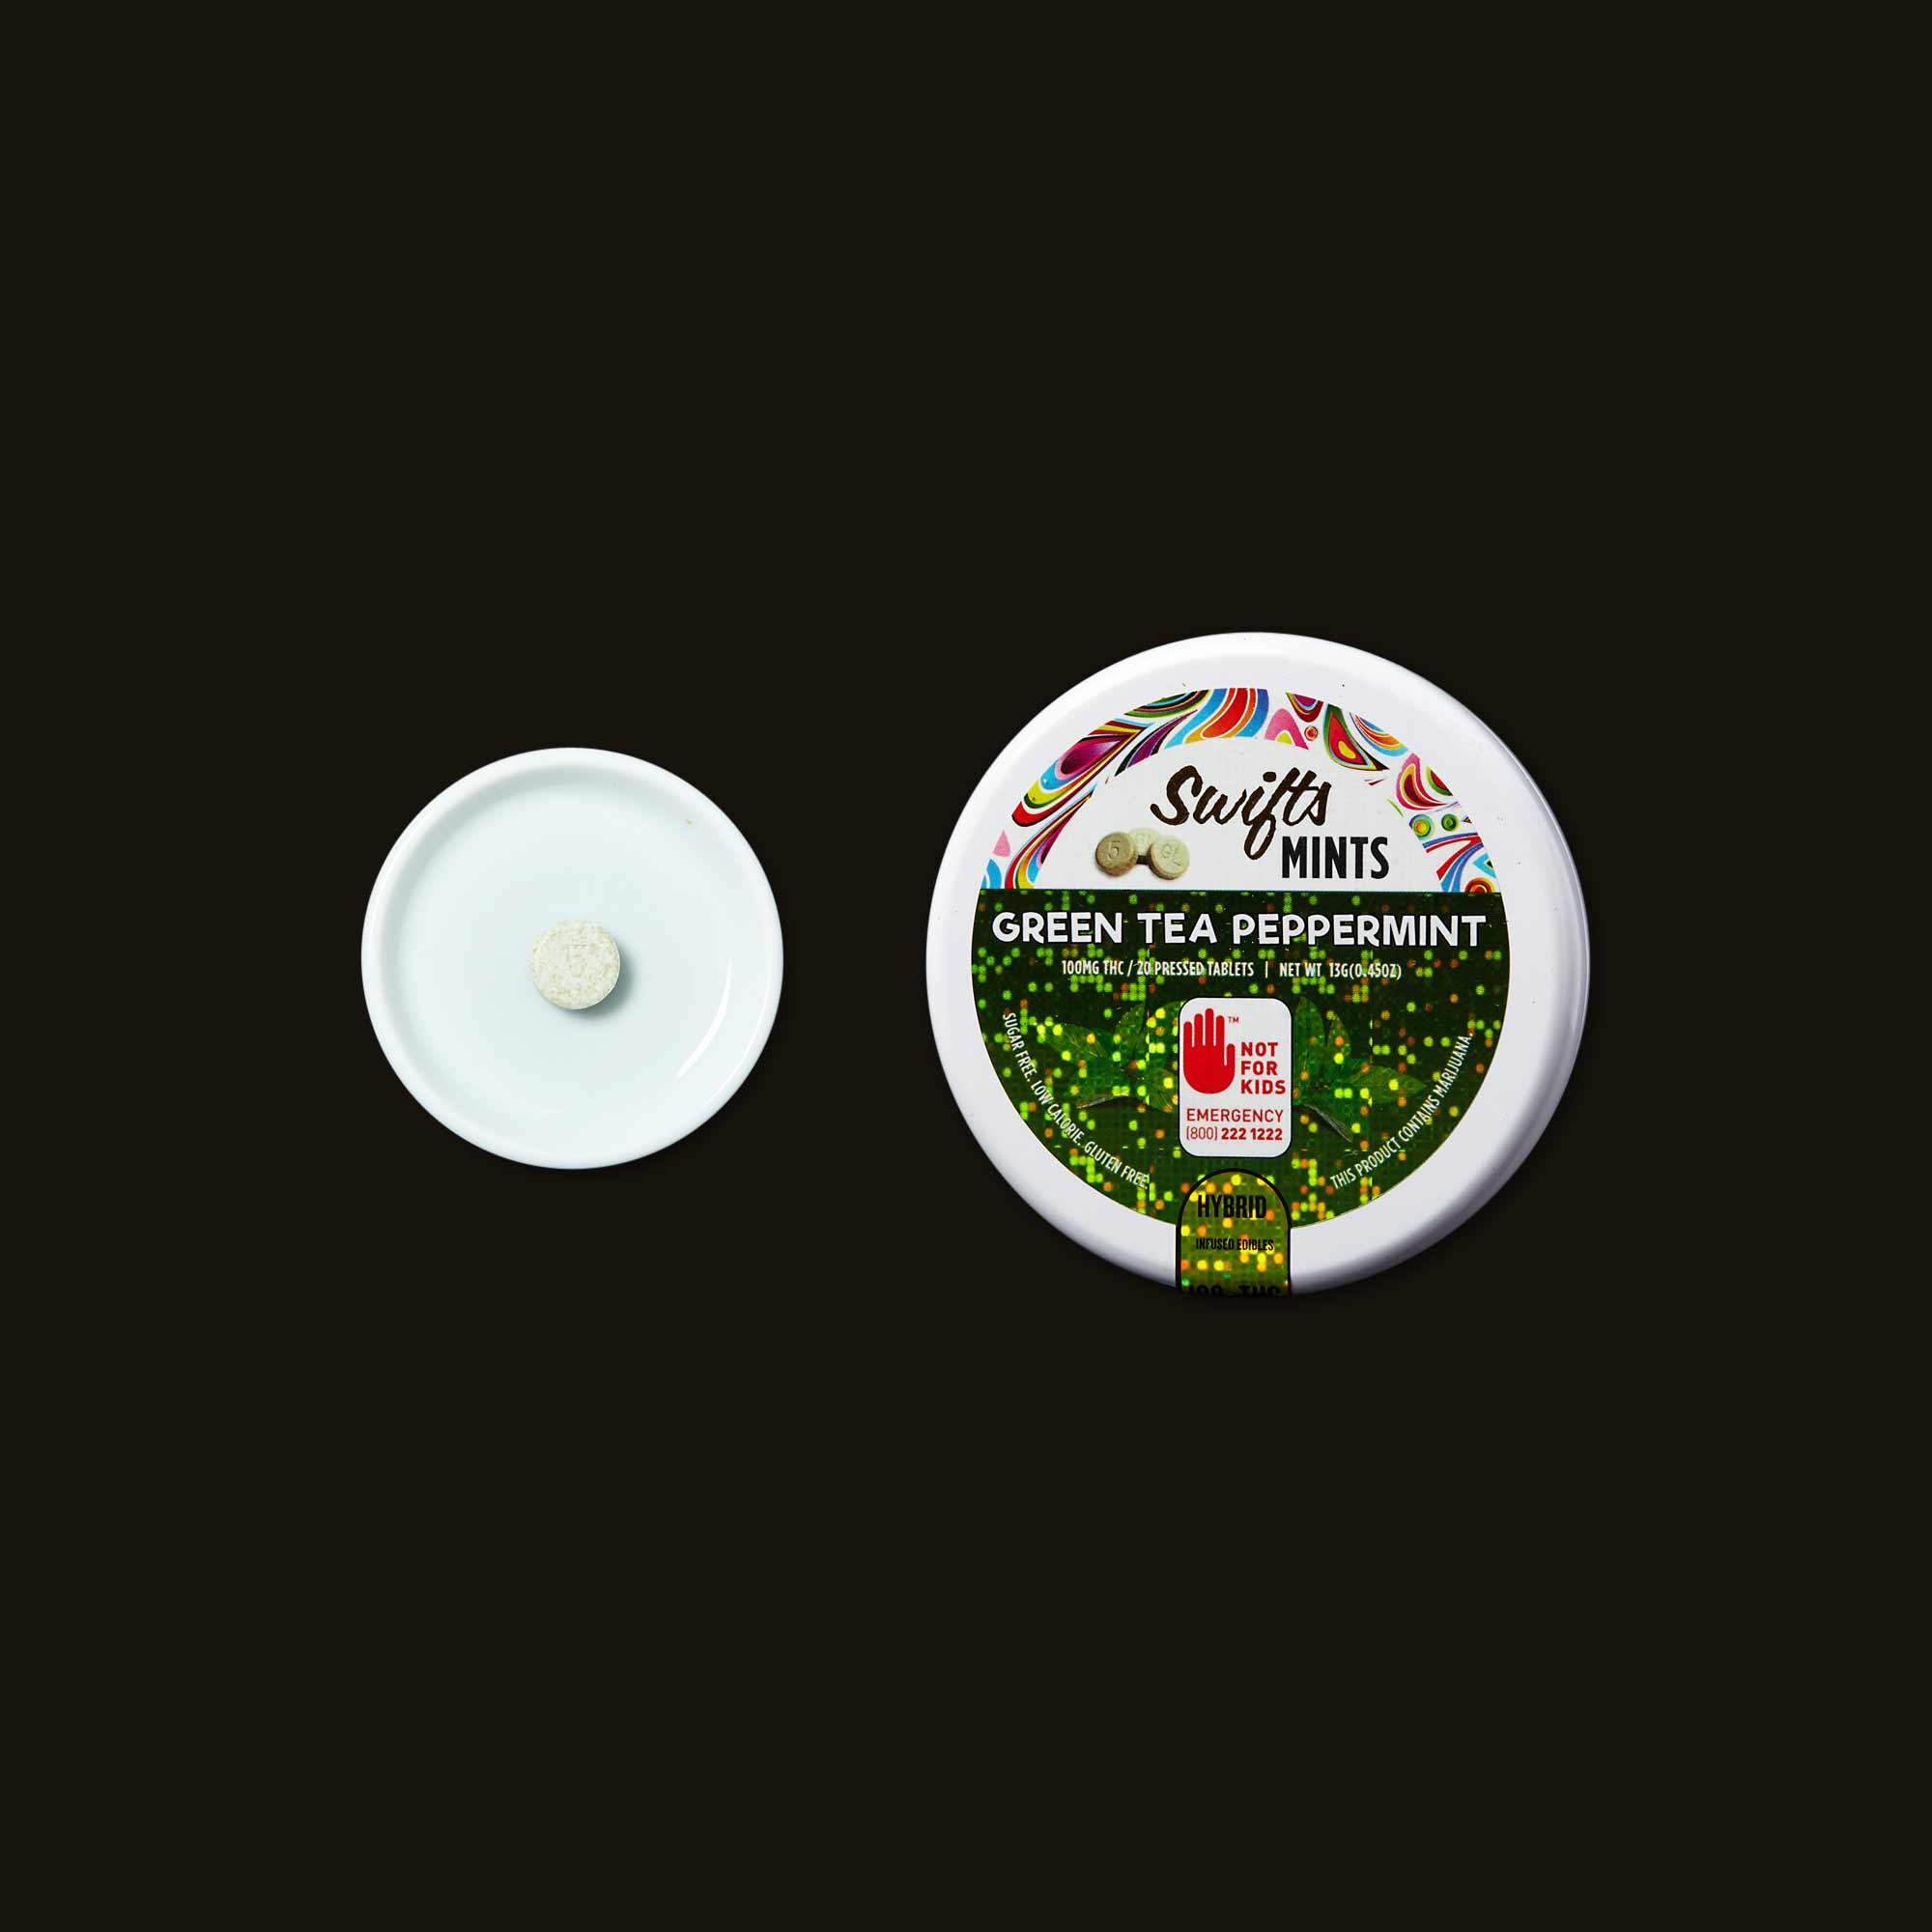 Swifts Edibles Green Tea & Peppermint Mints